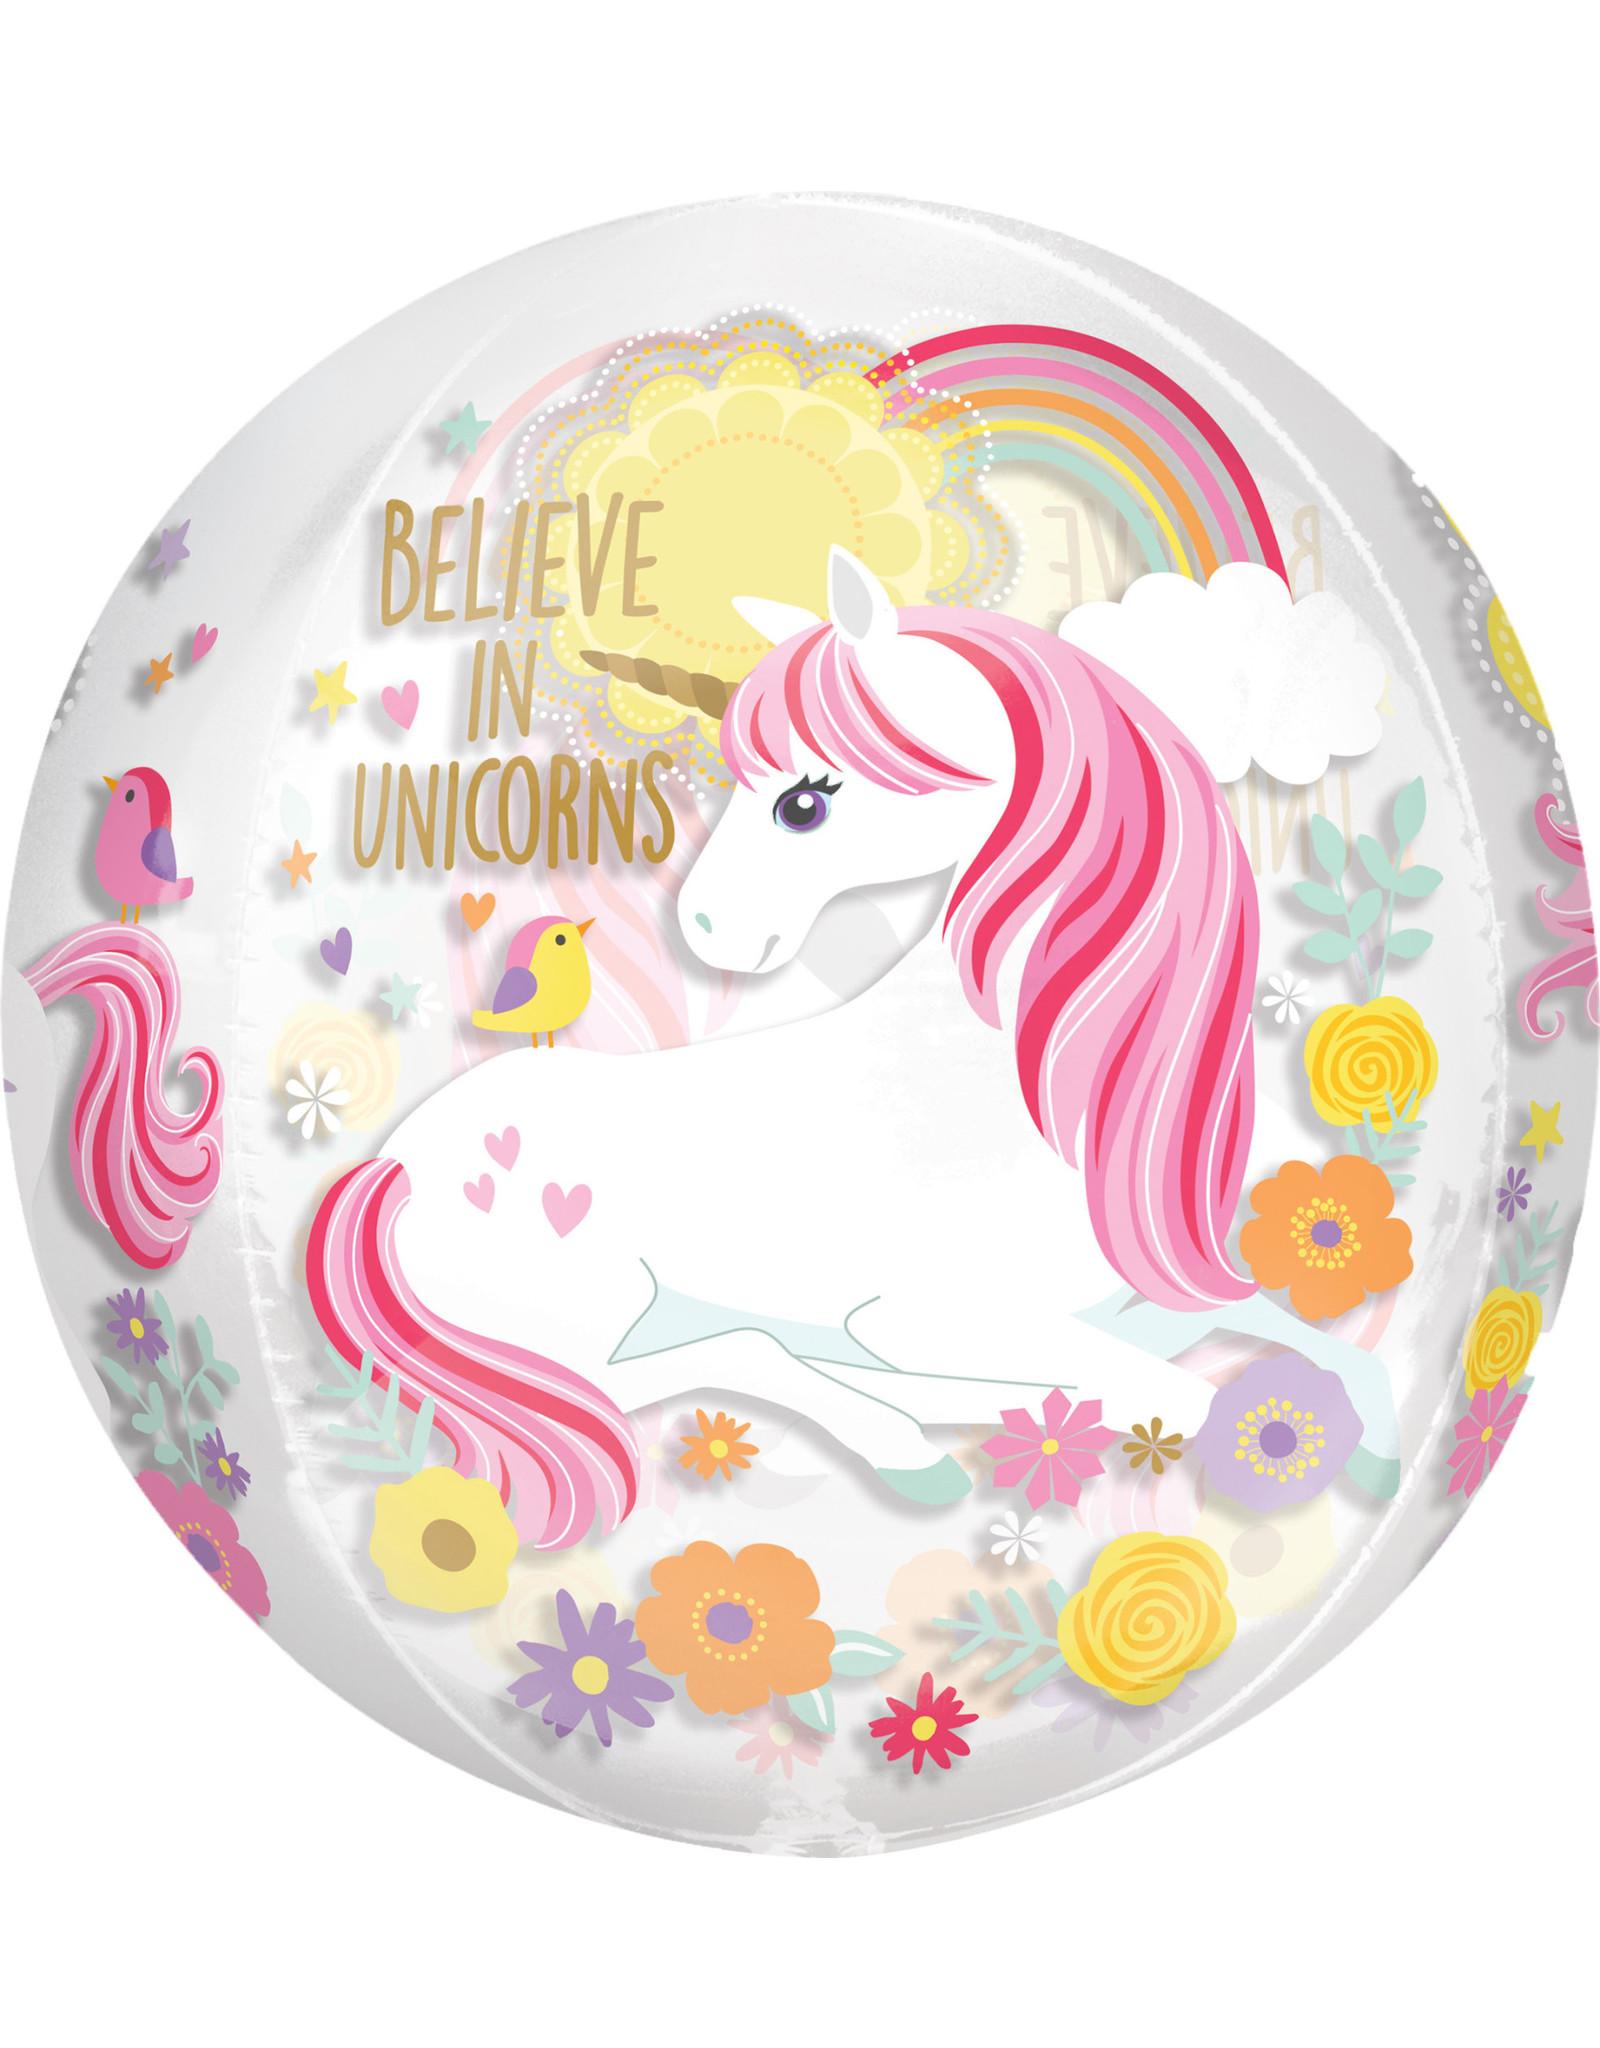 Amscan folieballon orbz unicorn 38 x 40 cm